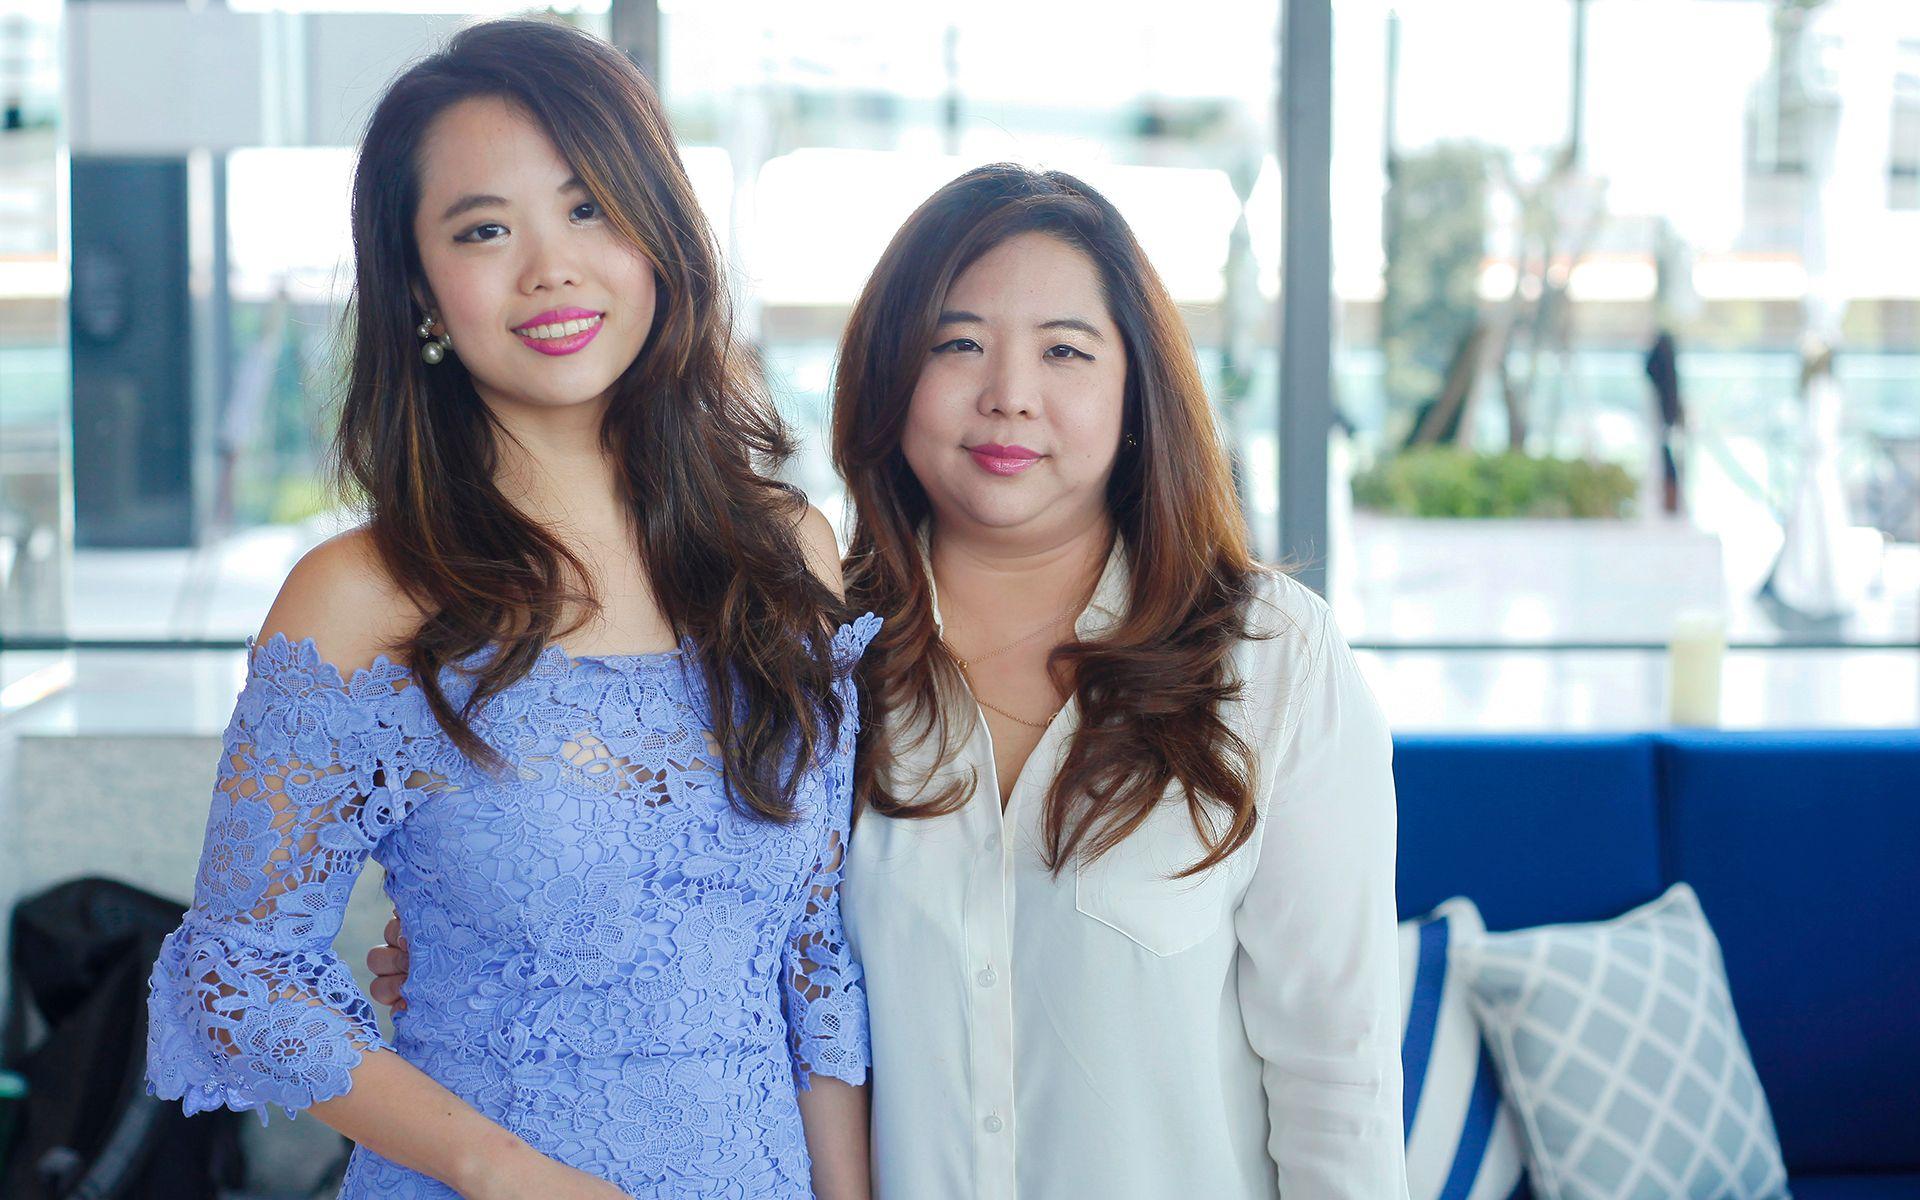 Yap Po Leen and Yap Ai Leen